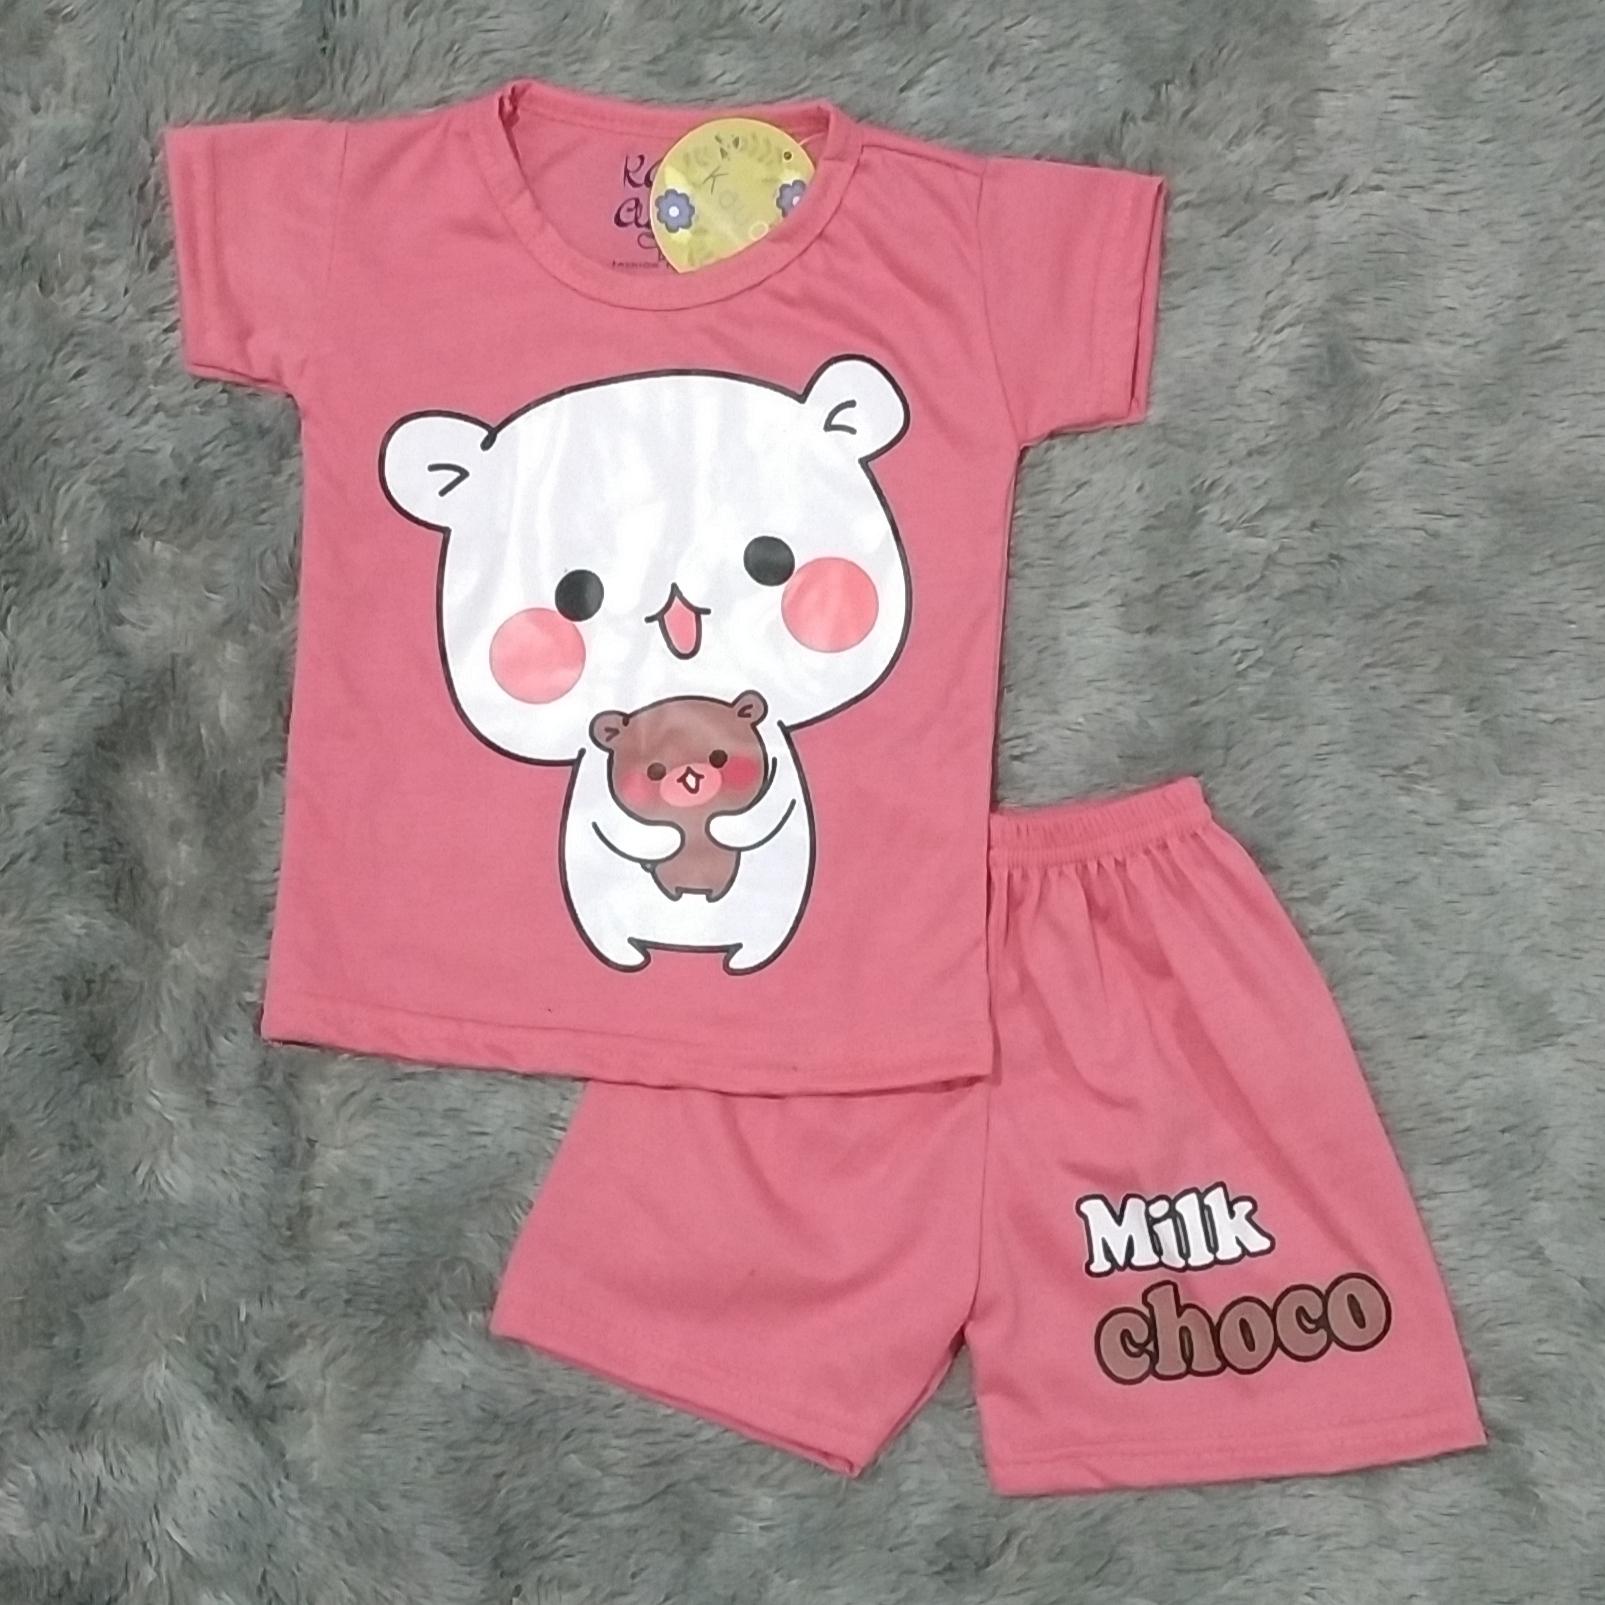 cod setelan baju anak anak motif milk choco size xs s m l untuk anak usia 0-4 tahun